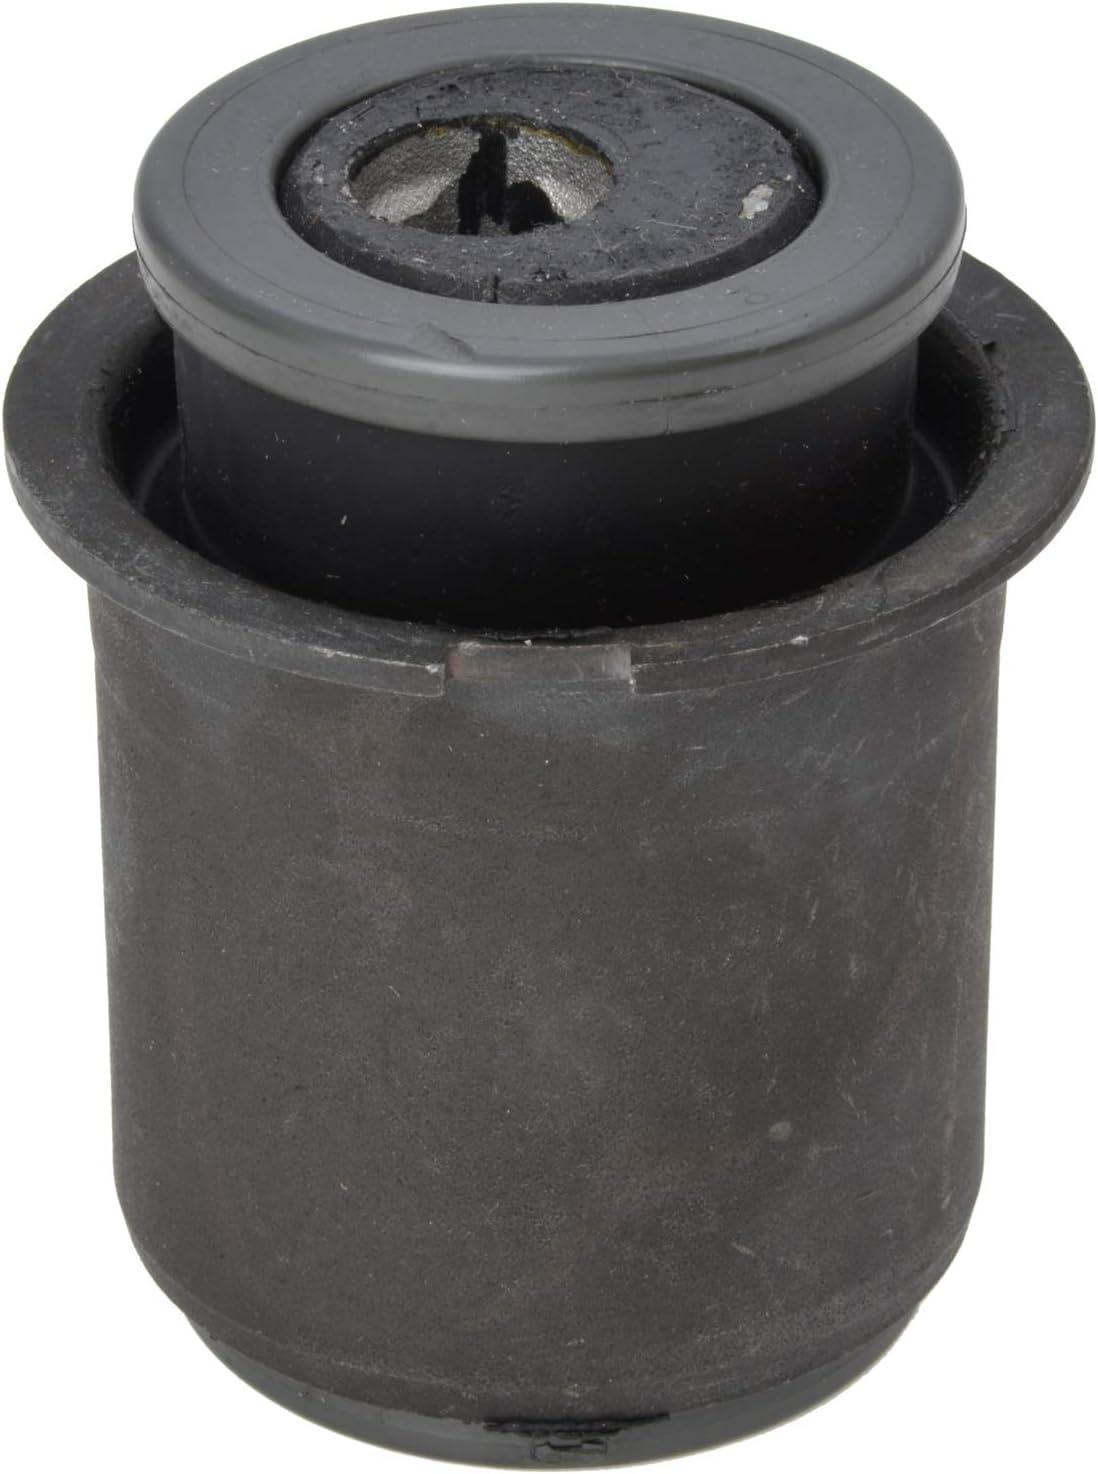 TRW JBU838 Premium Suspension Control Arm Bushing